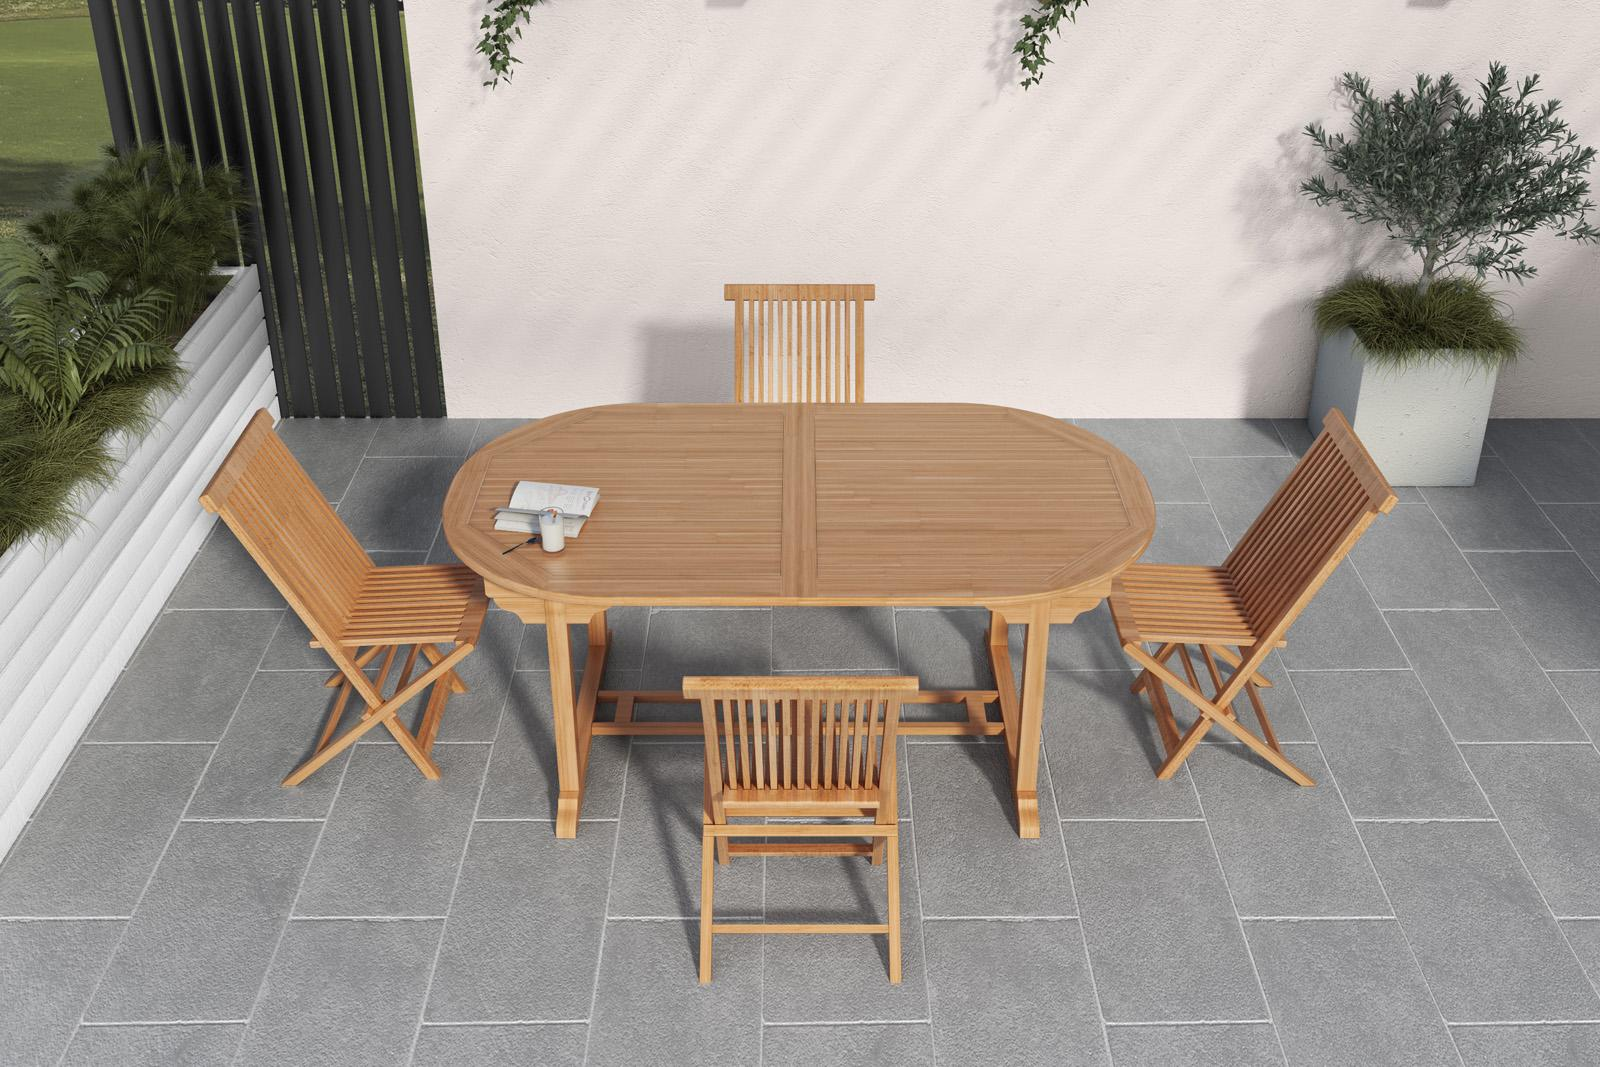 Set pranzo da giardino in legno teak tavolo 150-200cm e 4 ...